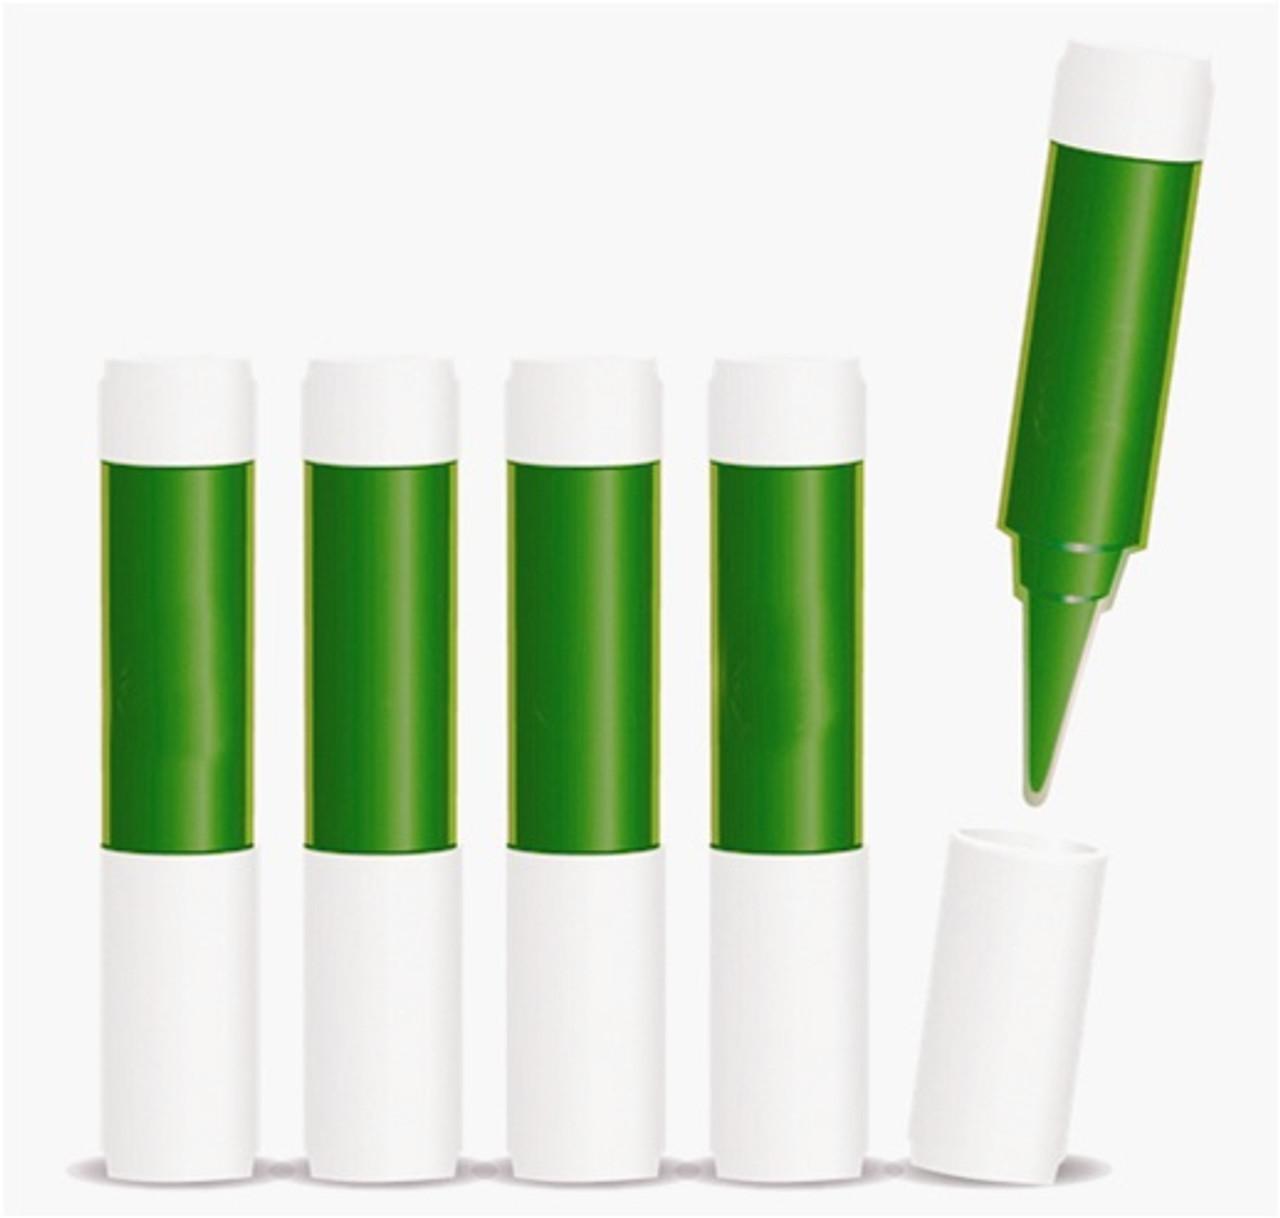 Ink Refill for food safe Egg Stamp in green